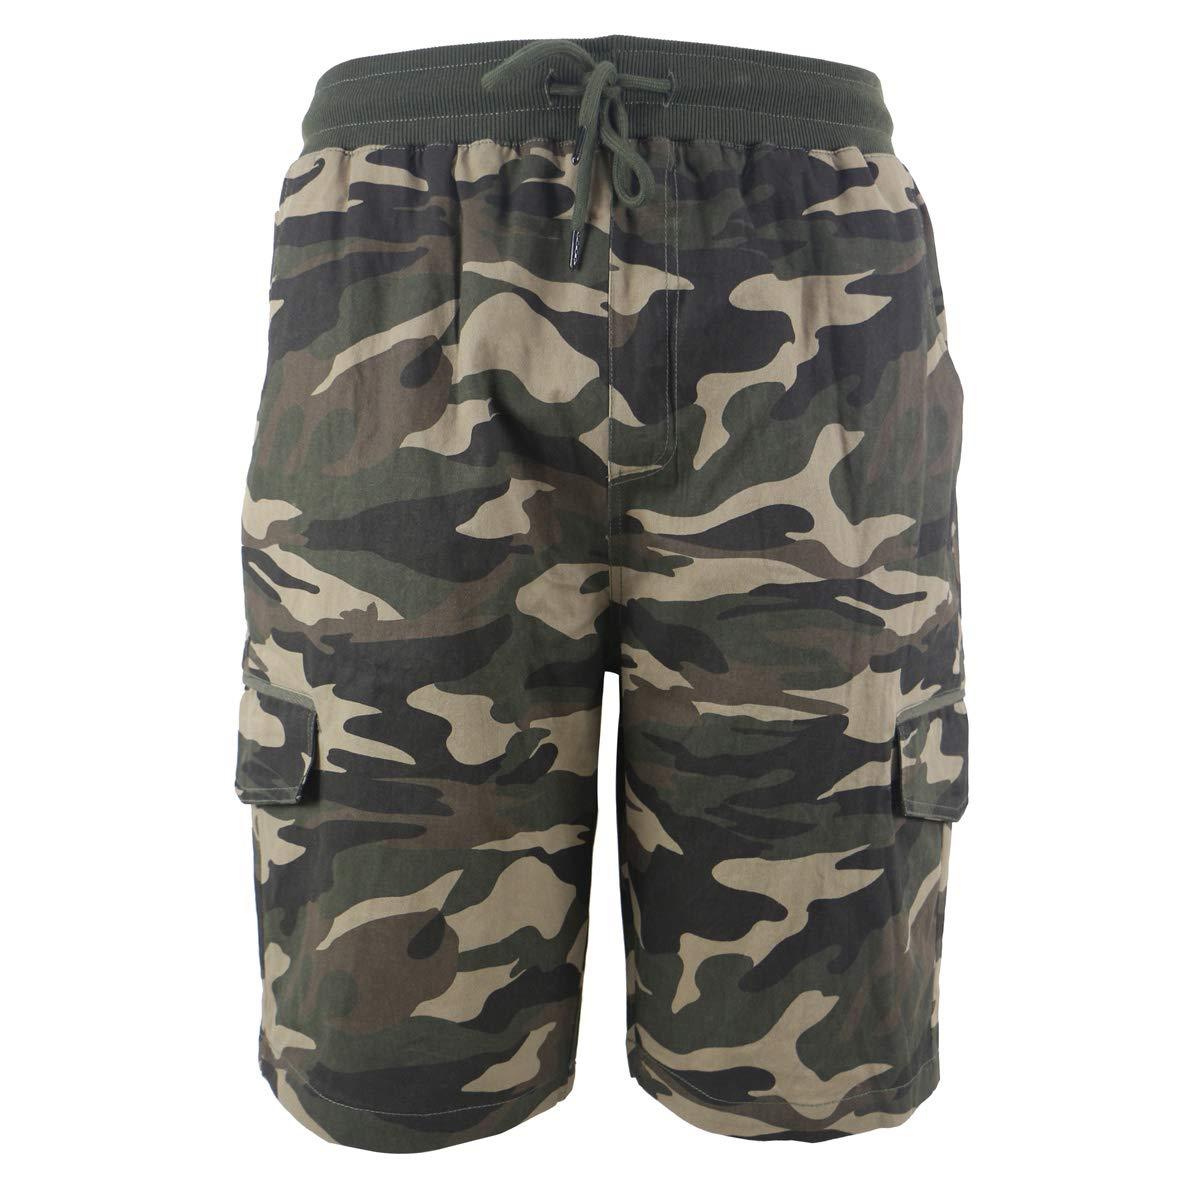 b56418ba16 Leehanton Mens Cargo Shorts Casual Elastic Waist Cotton Lightweight Multi  Pocket Short | Amazon.com